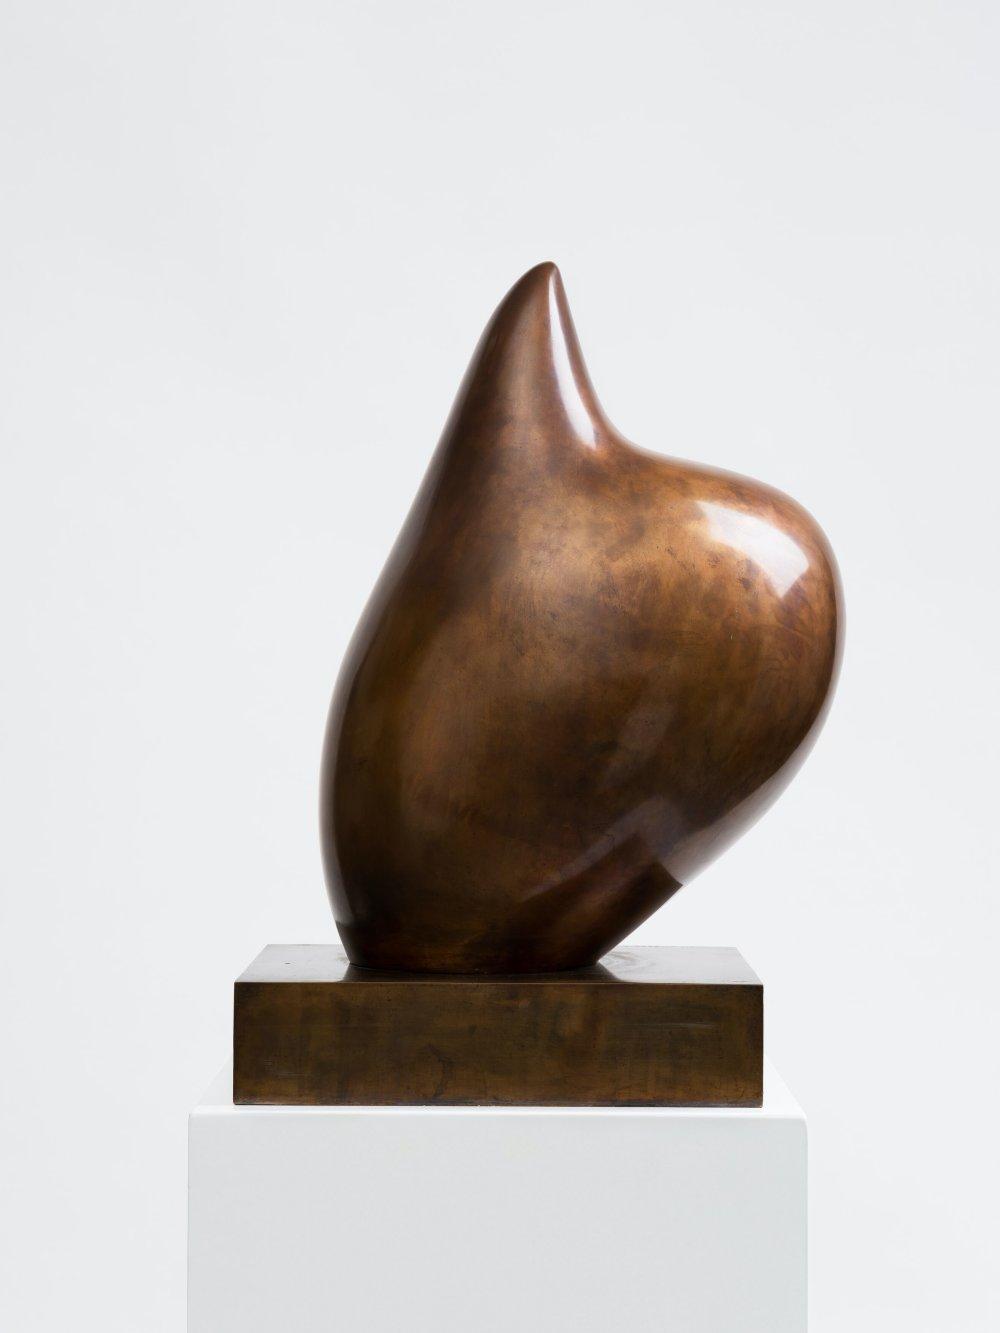 Skulptur ohne Namen (Sculpture Without a Name)